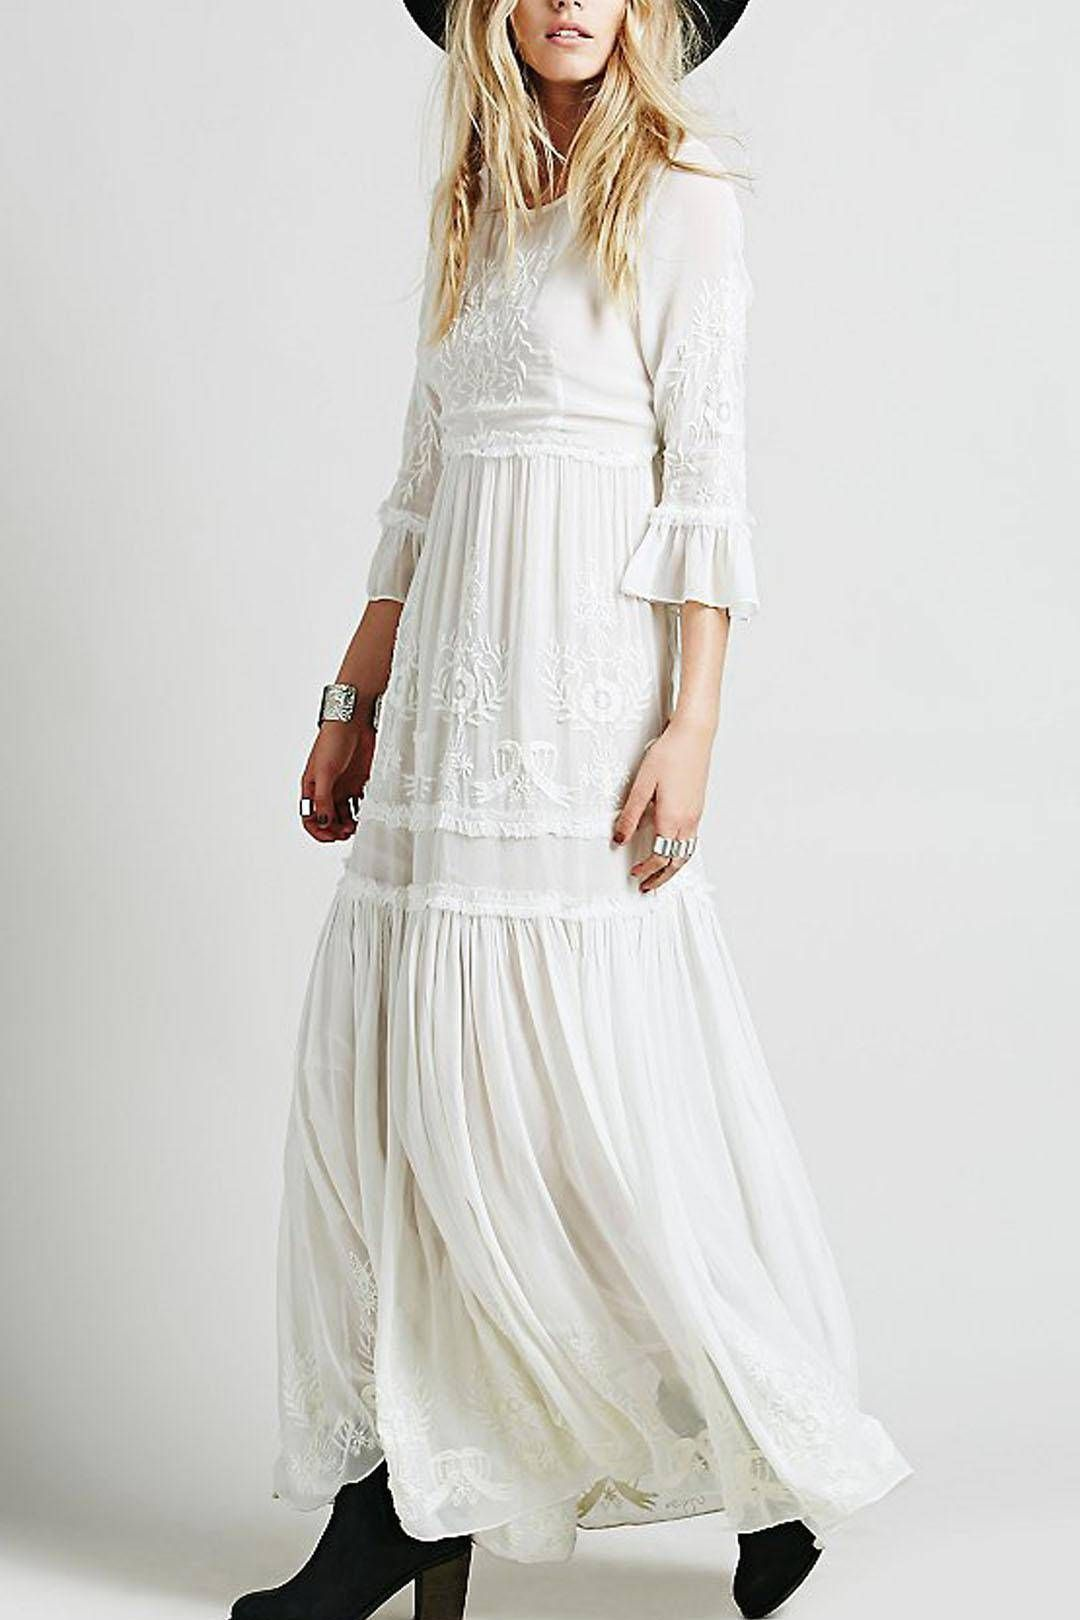 Campana mangas bordado vestido Maxi en White - US$49.95 -YOINS